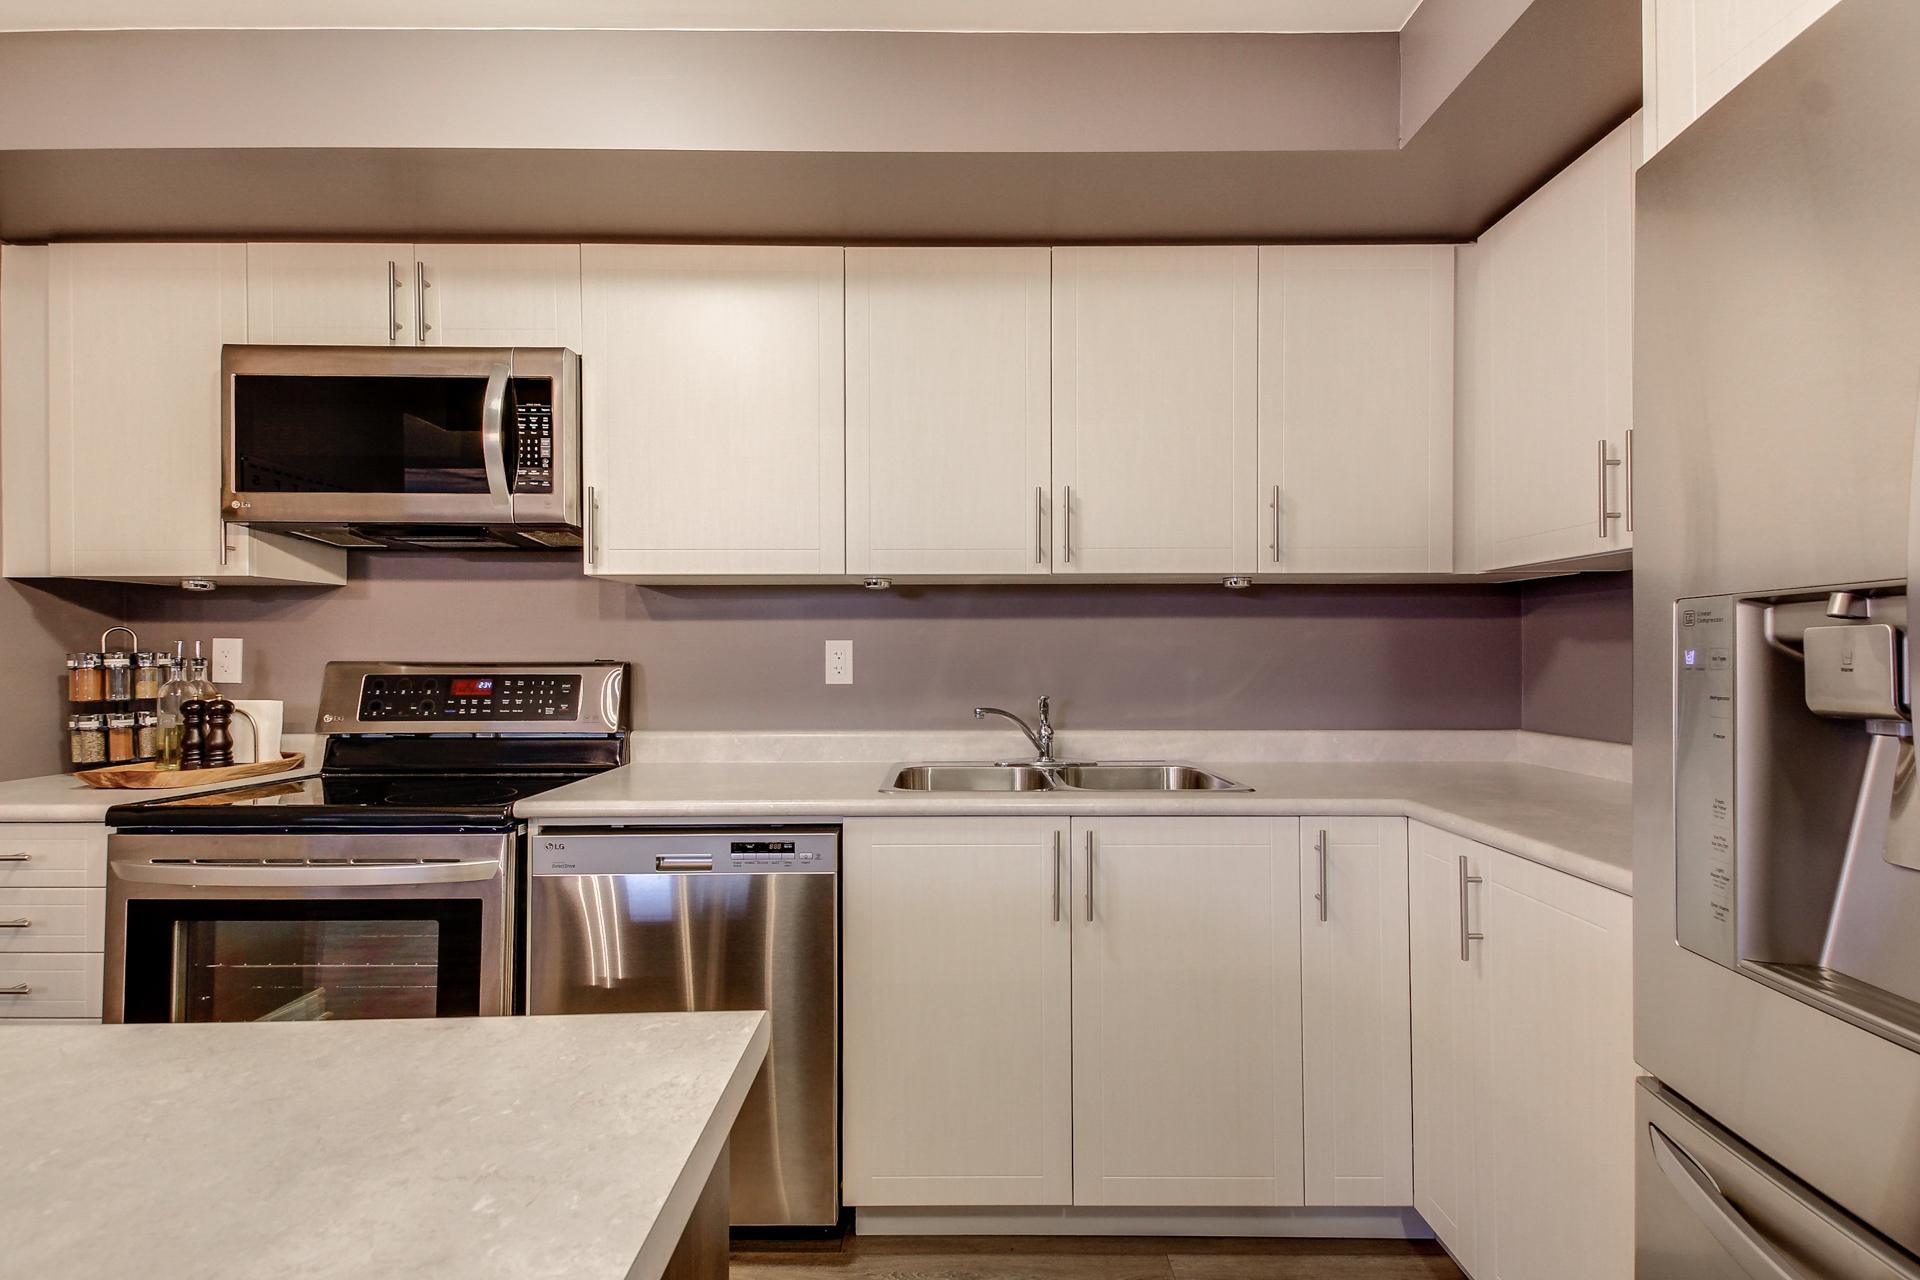 2420-Baronwood-Drive-2201-Oakville-For-Sale-Karly-Moore (14).jpg